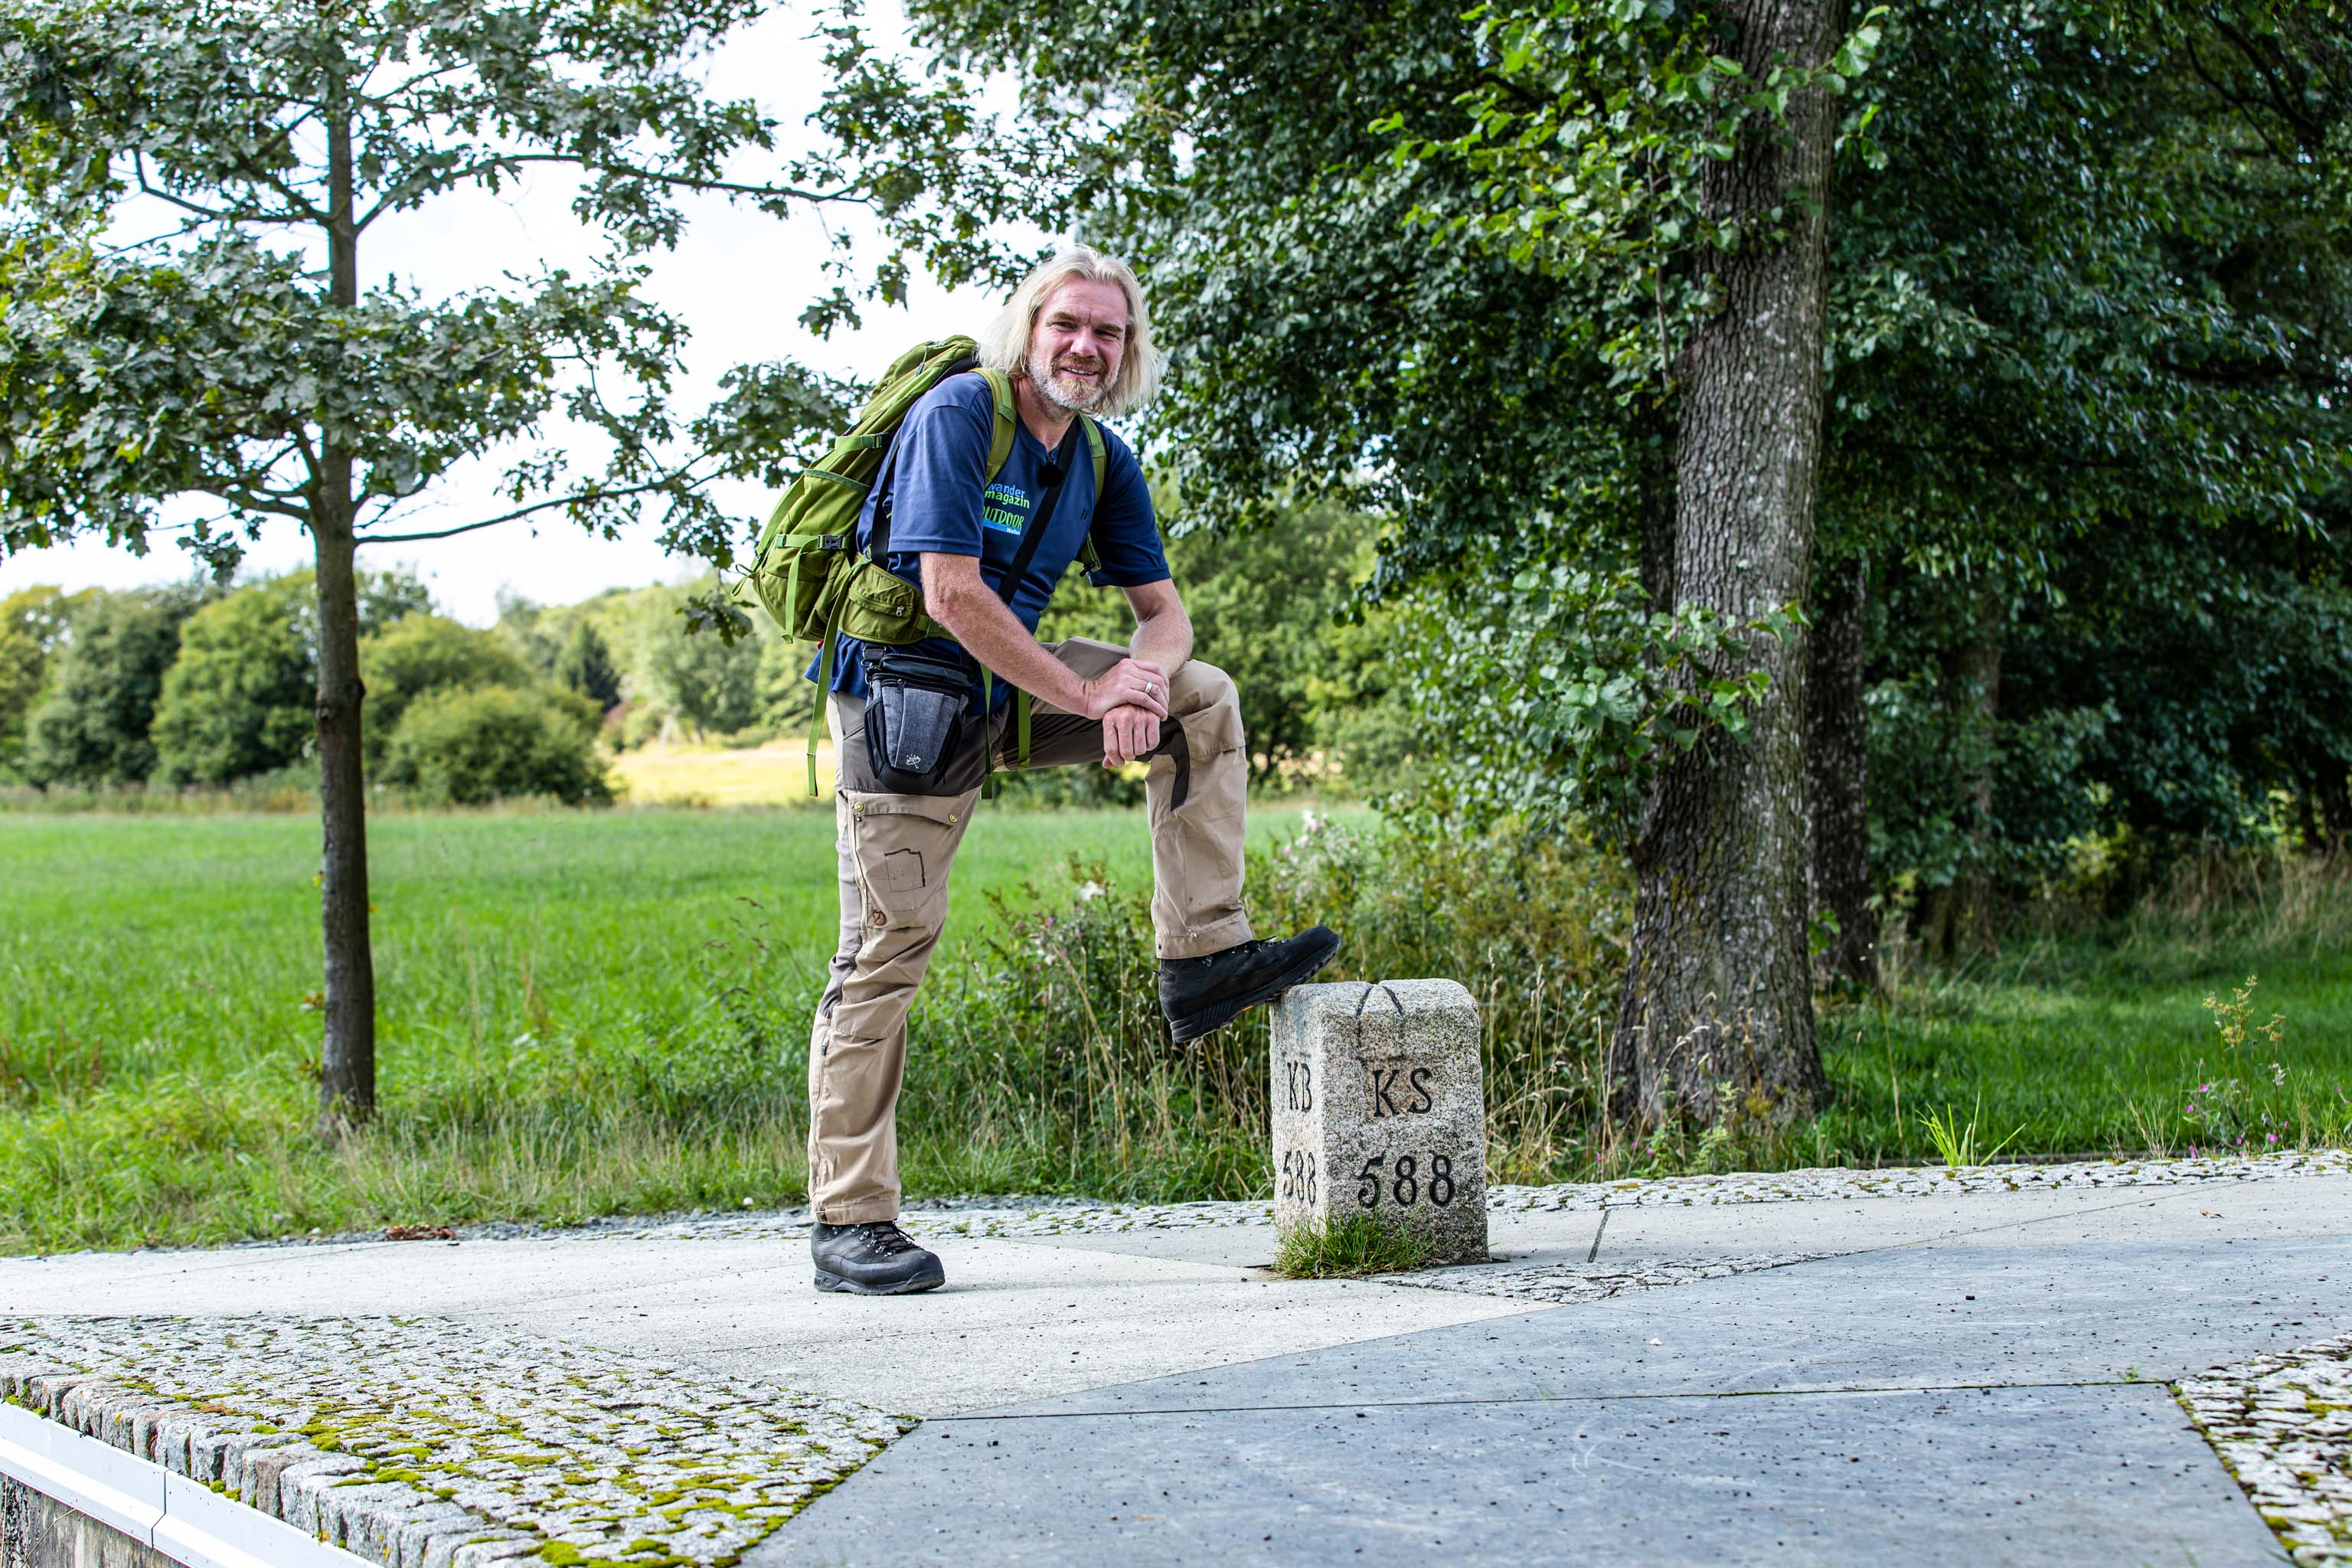 Thorsten Hoyer - Long distance hiking - hiking trails Germany - hiking in Germany - top trails in Germany